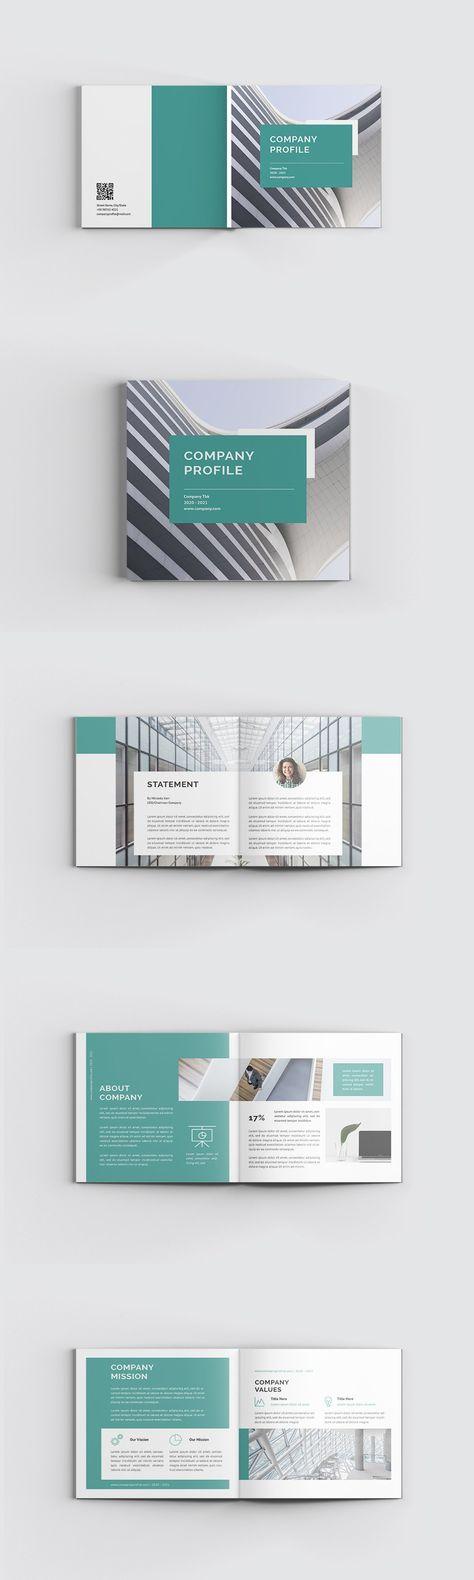 2020-2021 Company Profile